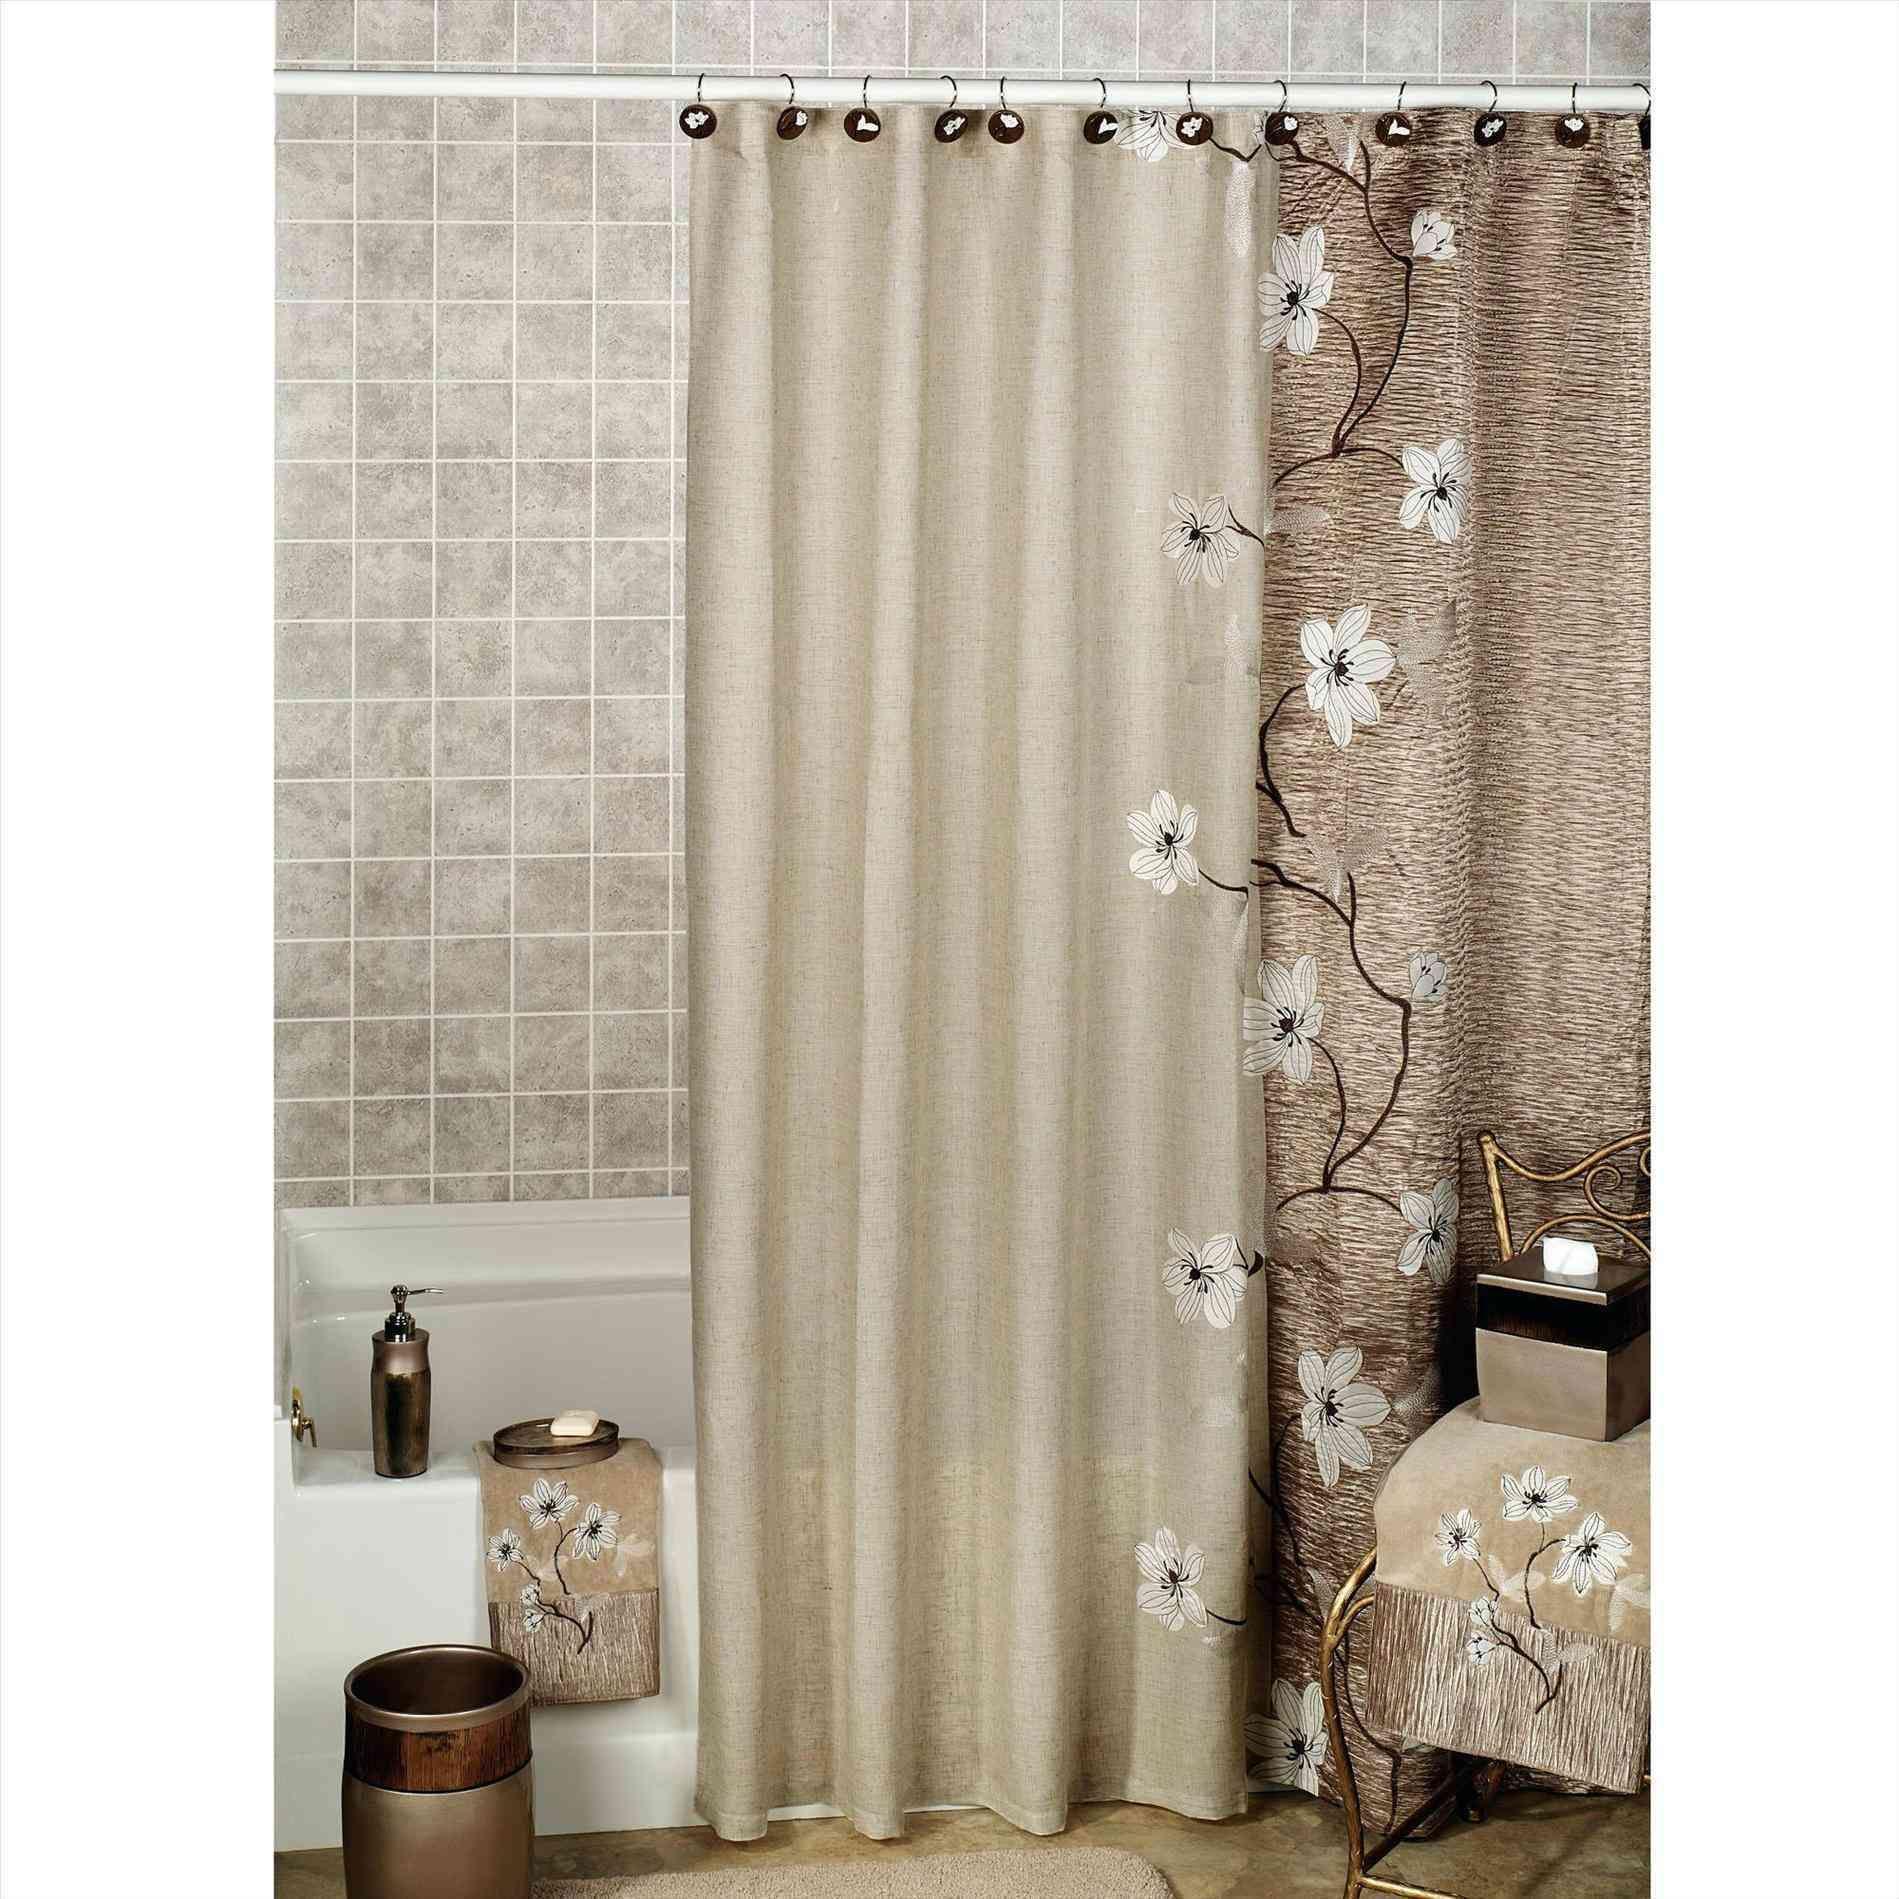 New Post modern bathroom shower curtains LivingRooms Pinterest